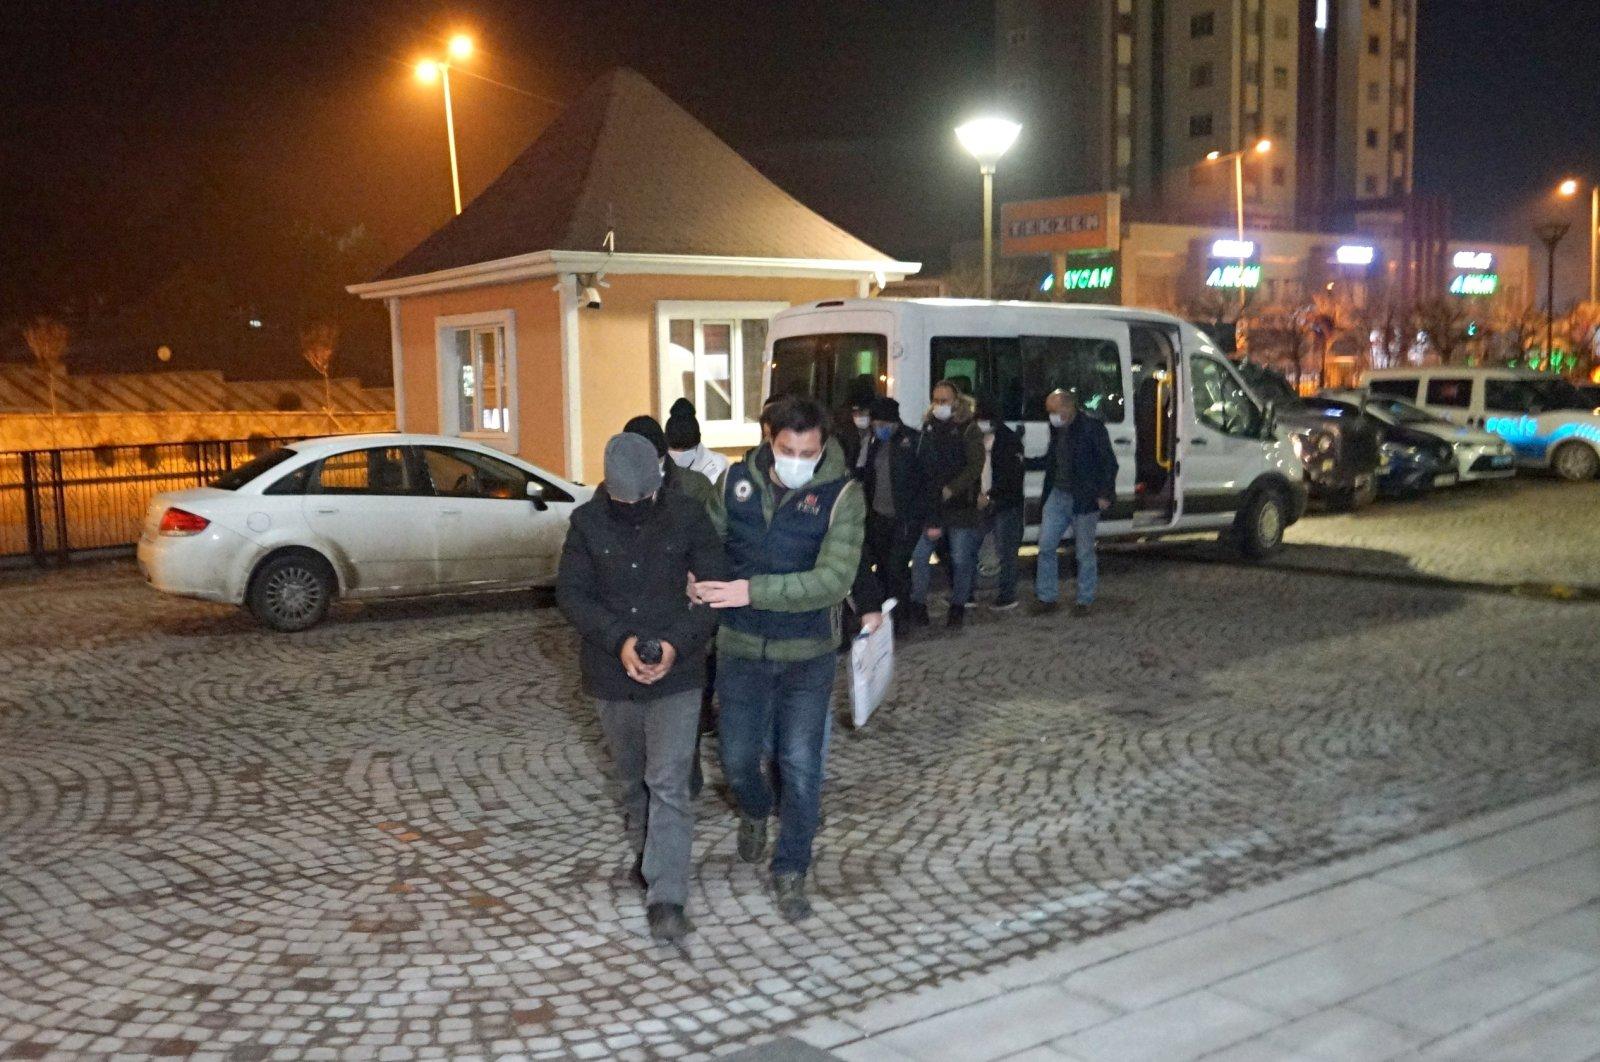 Police escort Daesh suspects arrested in northern Turkey's Kastamonu province, Jan. 24, 2021. (İHA Photo)